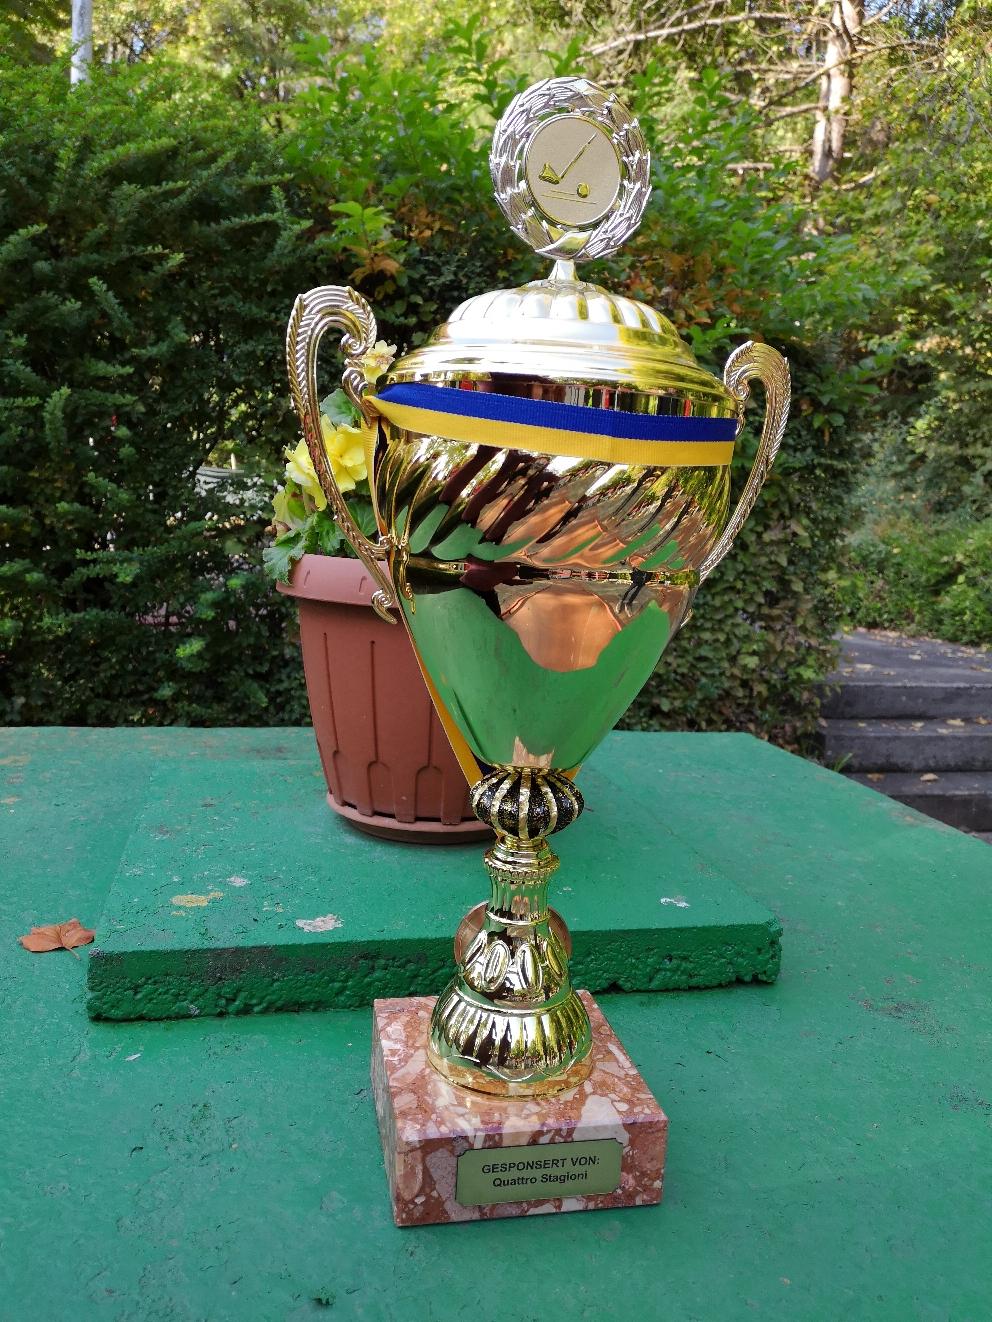 Wanderpokal der Senioren I, Sponsor Quattro Stagioni